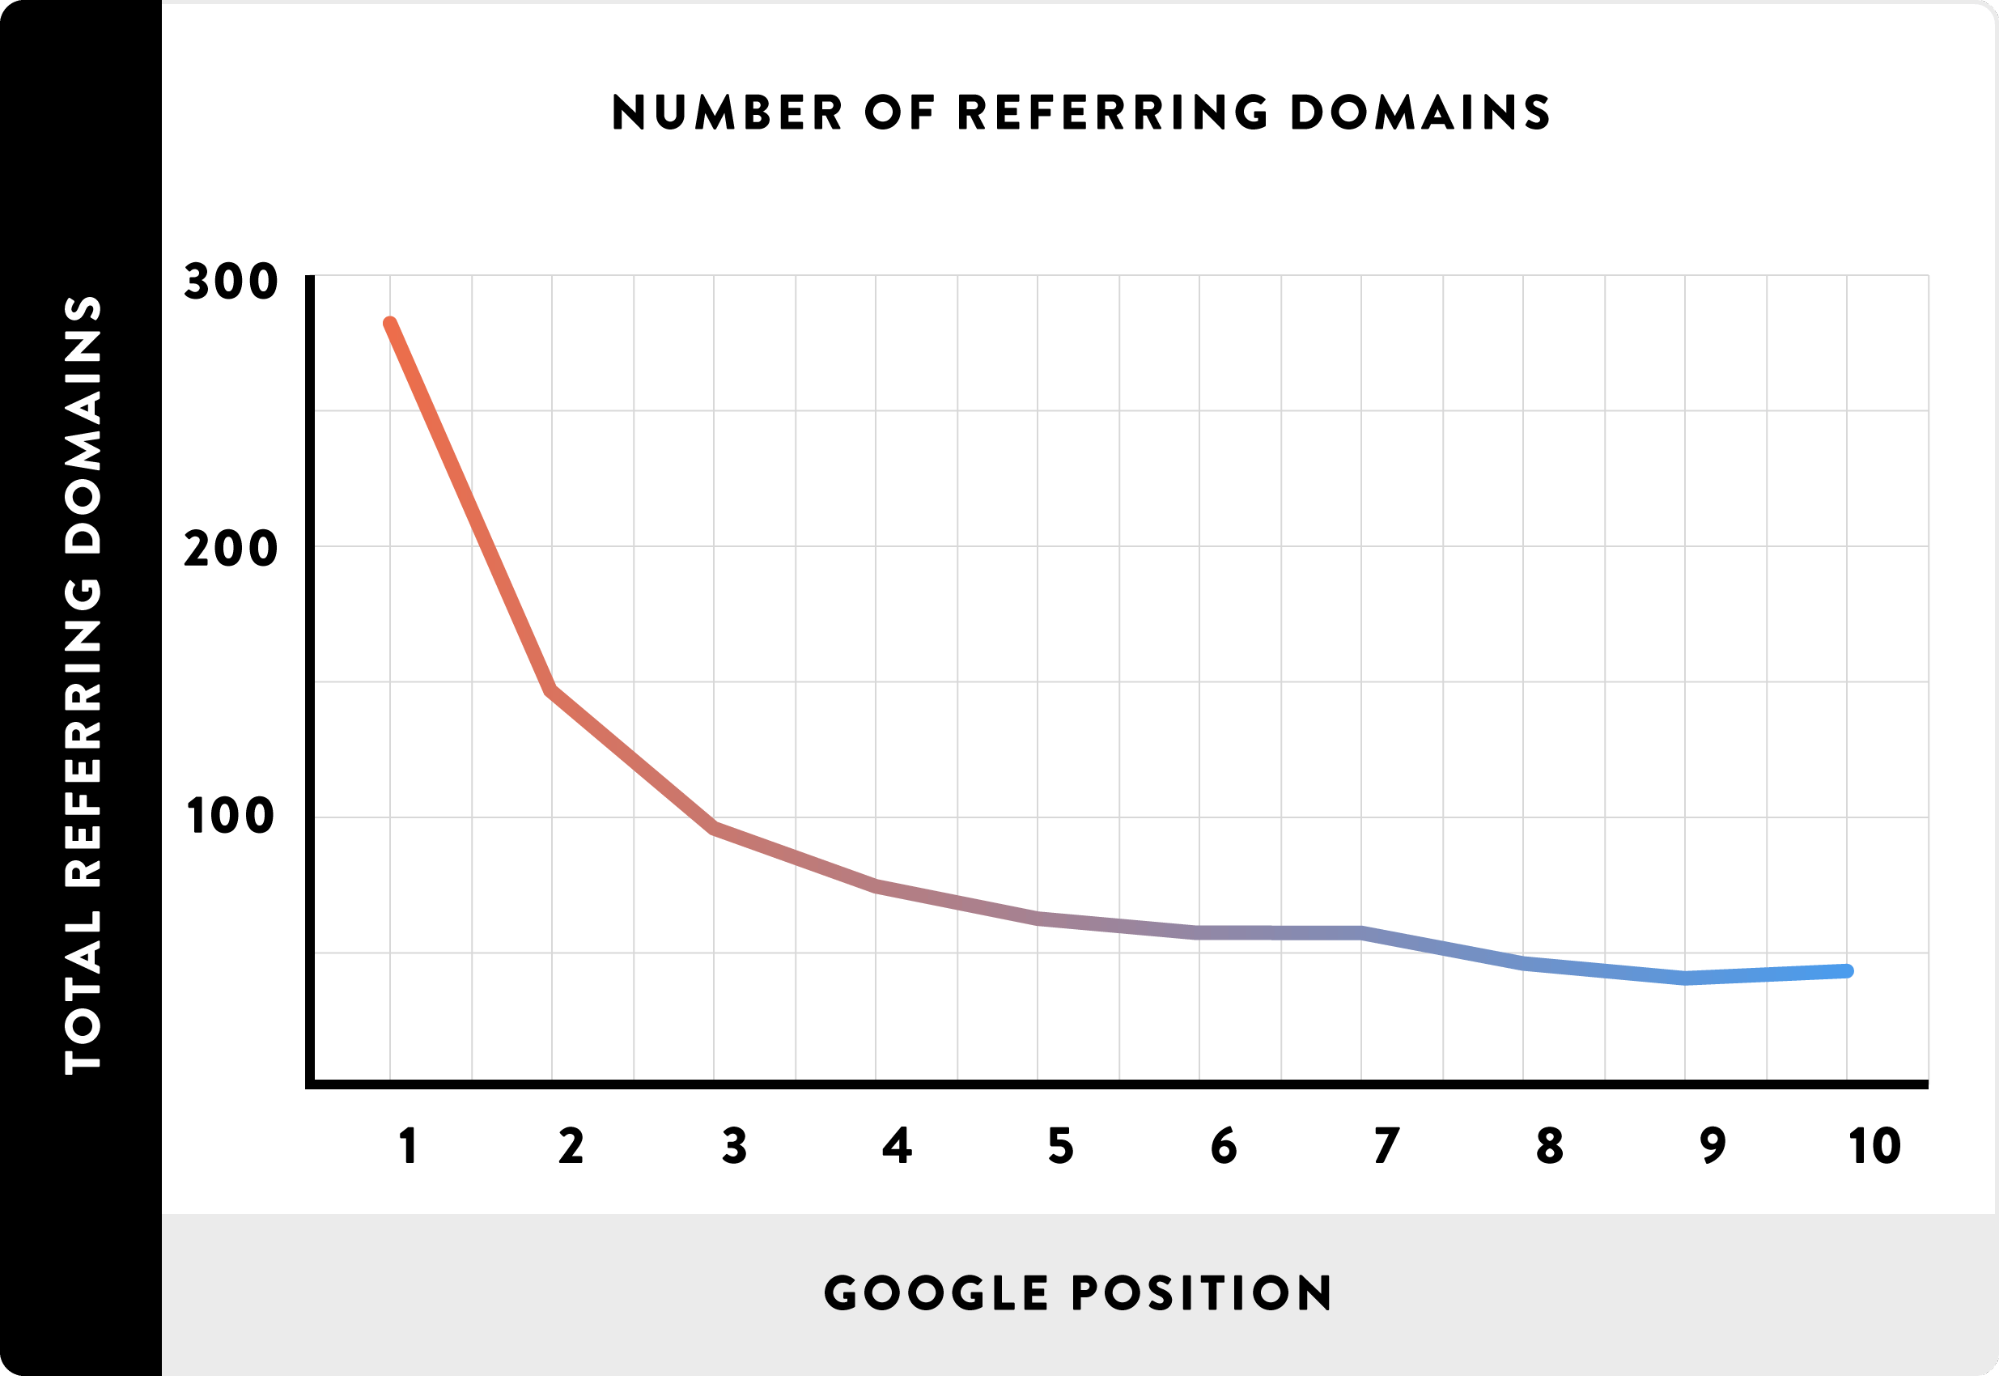 referring domains vs google position